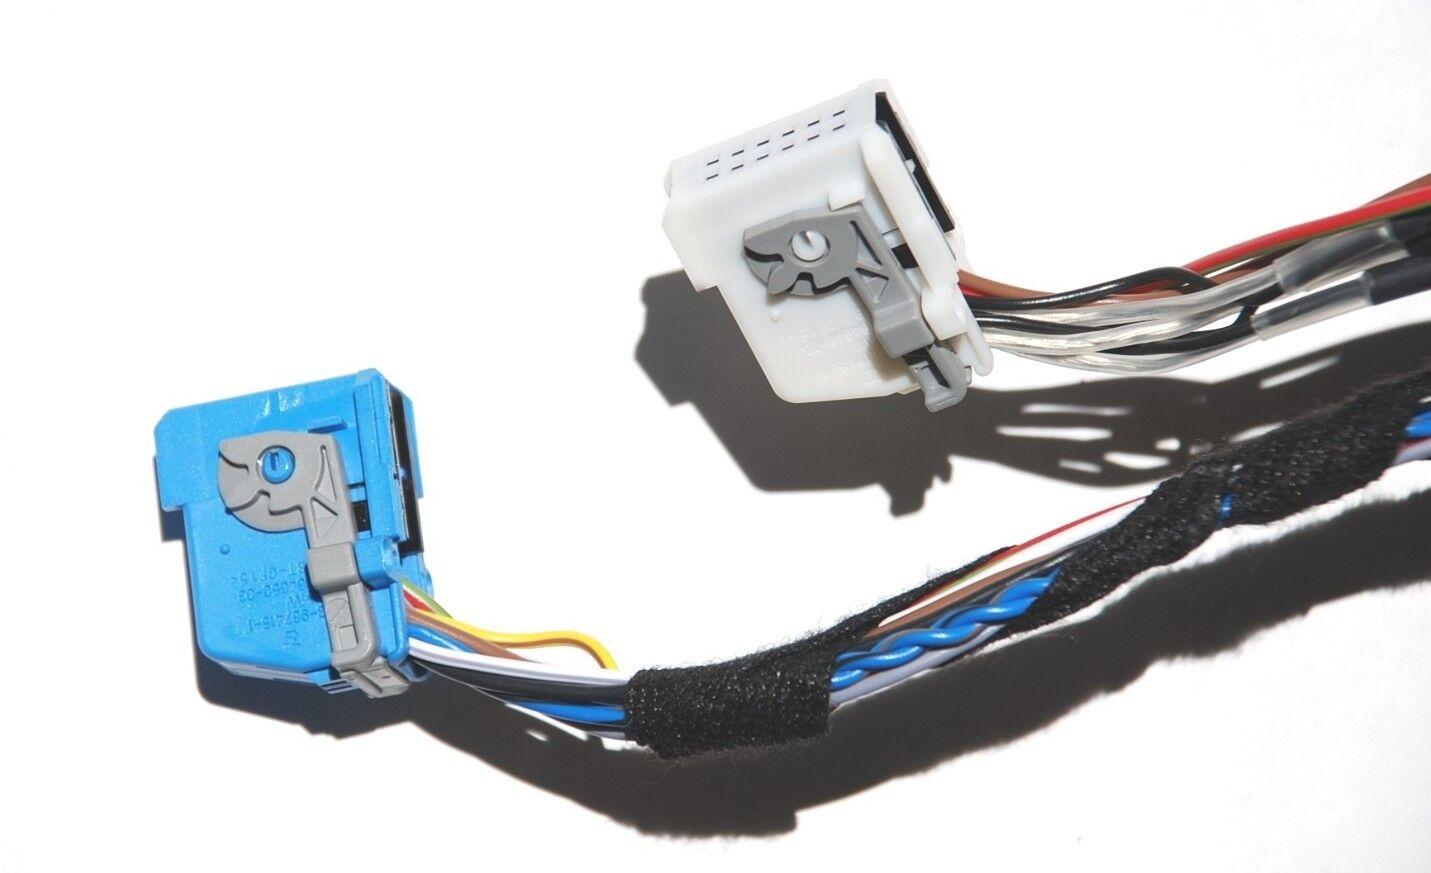 bmw e46 3-series m3 navigation system retrofit wiring ... bmw e46 gps wiring harness